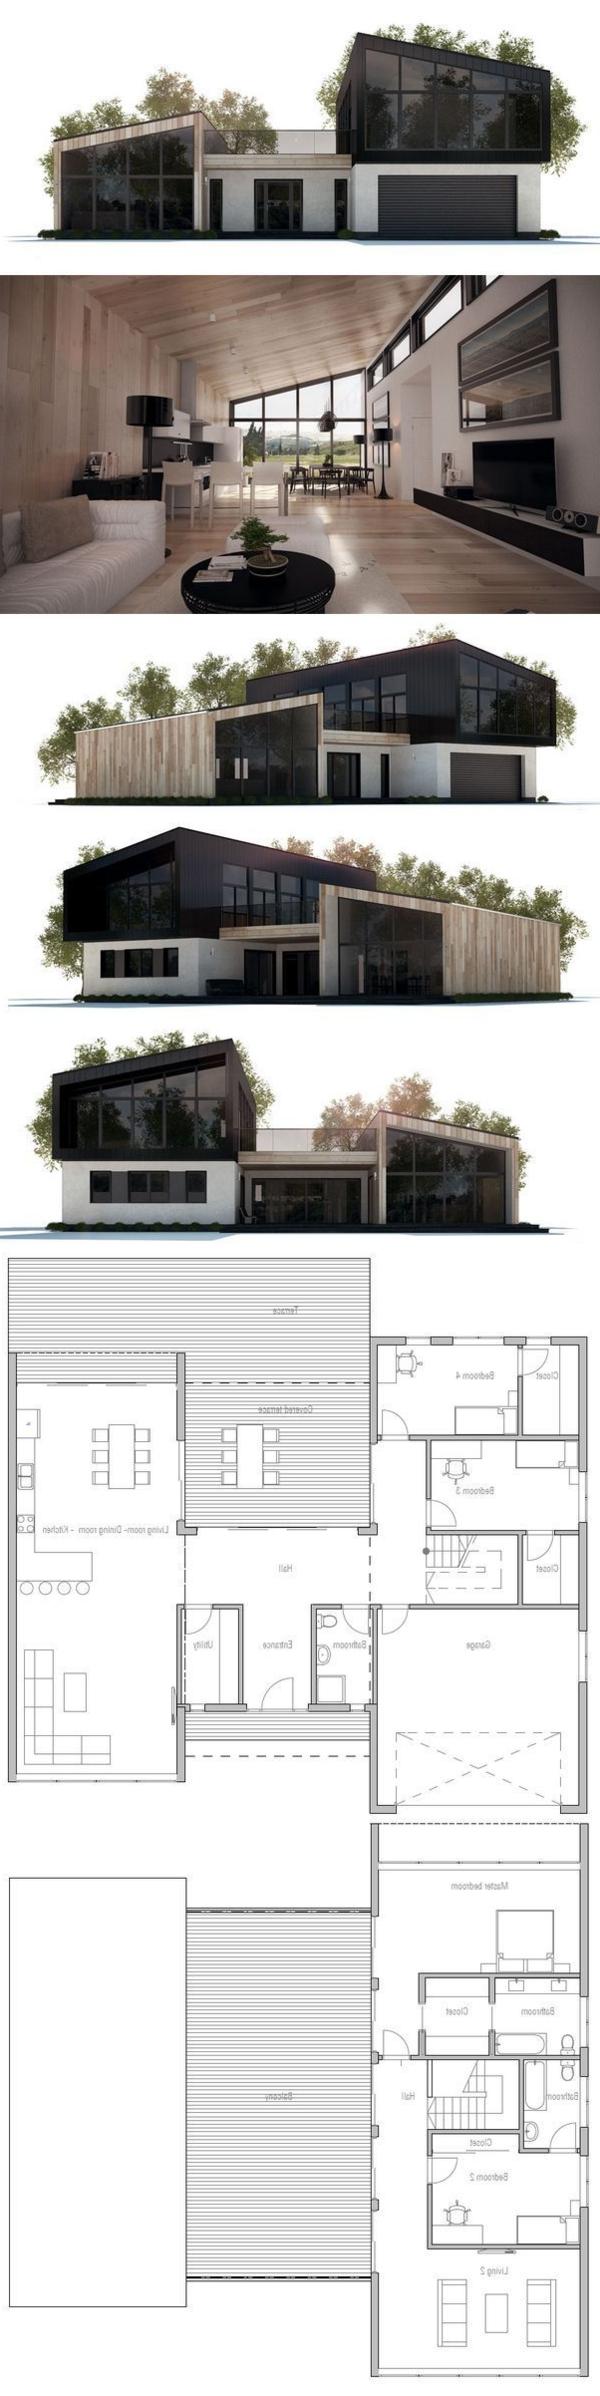 la maison plain pied moderne. Black Bedroom Furniture Sets. Home Design Ideas